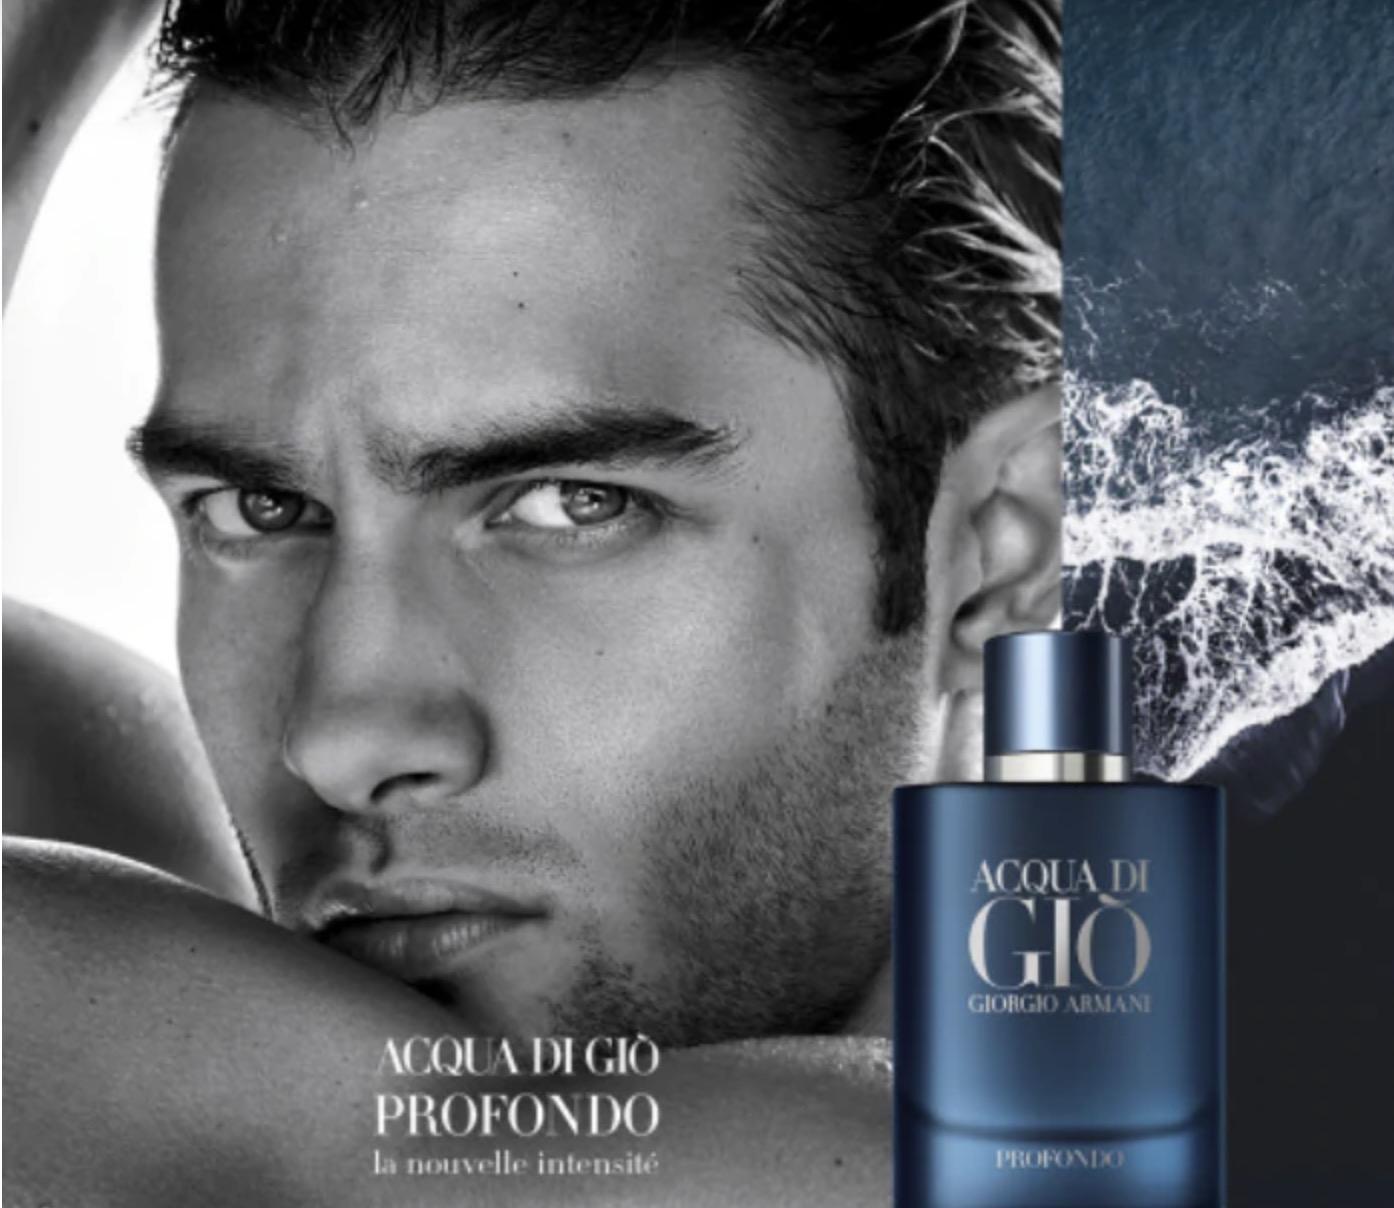 Code promo Sephora : 1 échantillon du parfum ACQUA DI GIÒ PROFONDO 1.2ml offert gratuitement